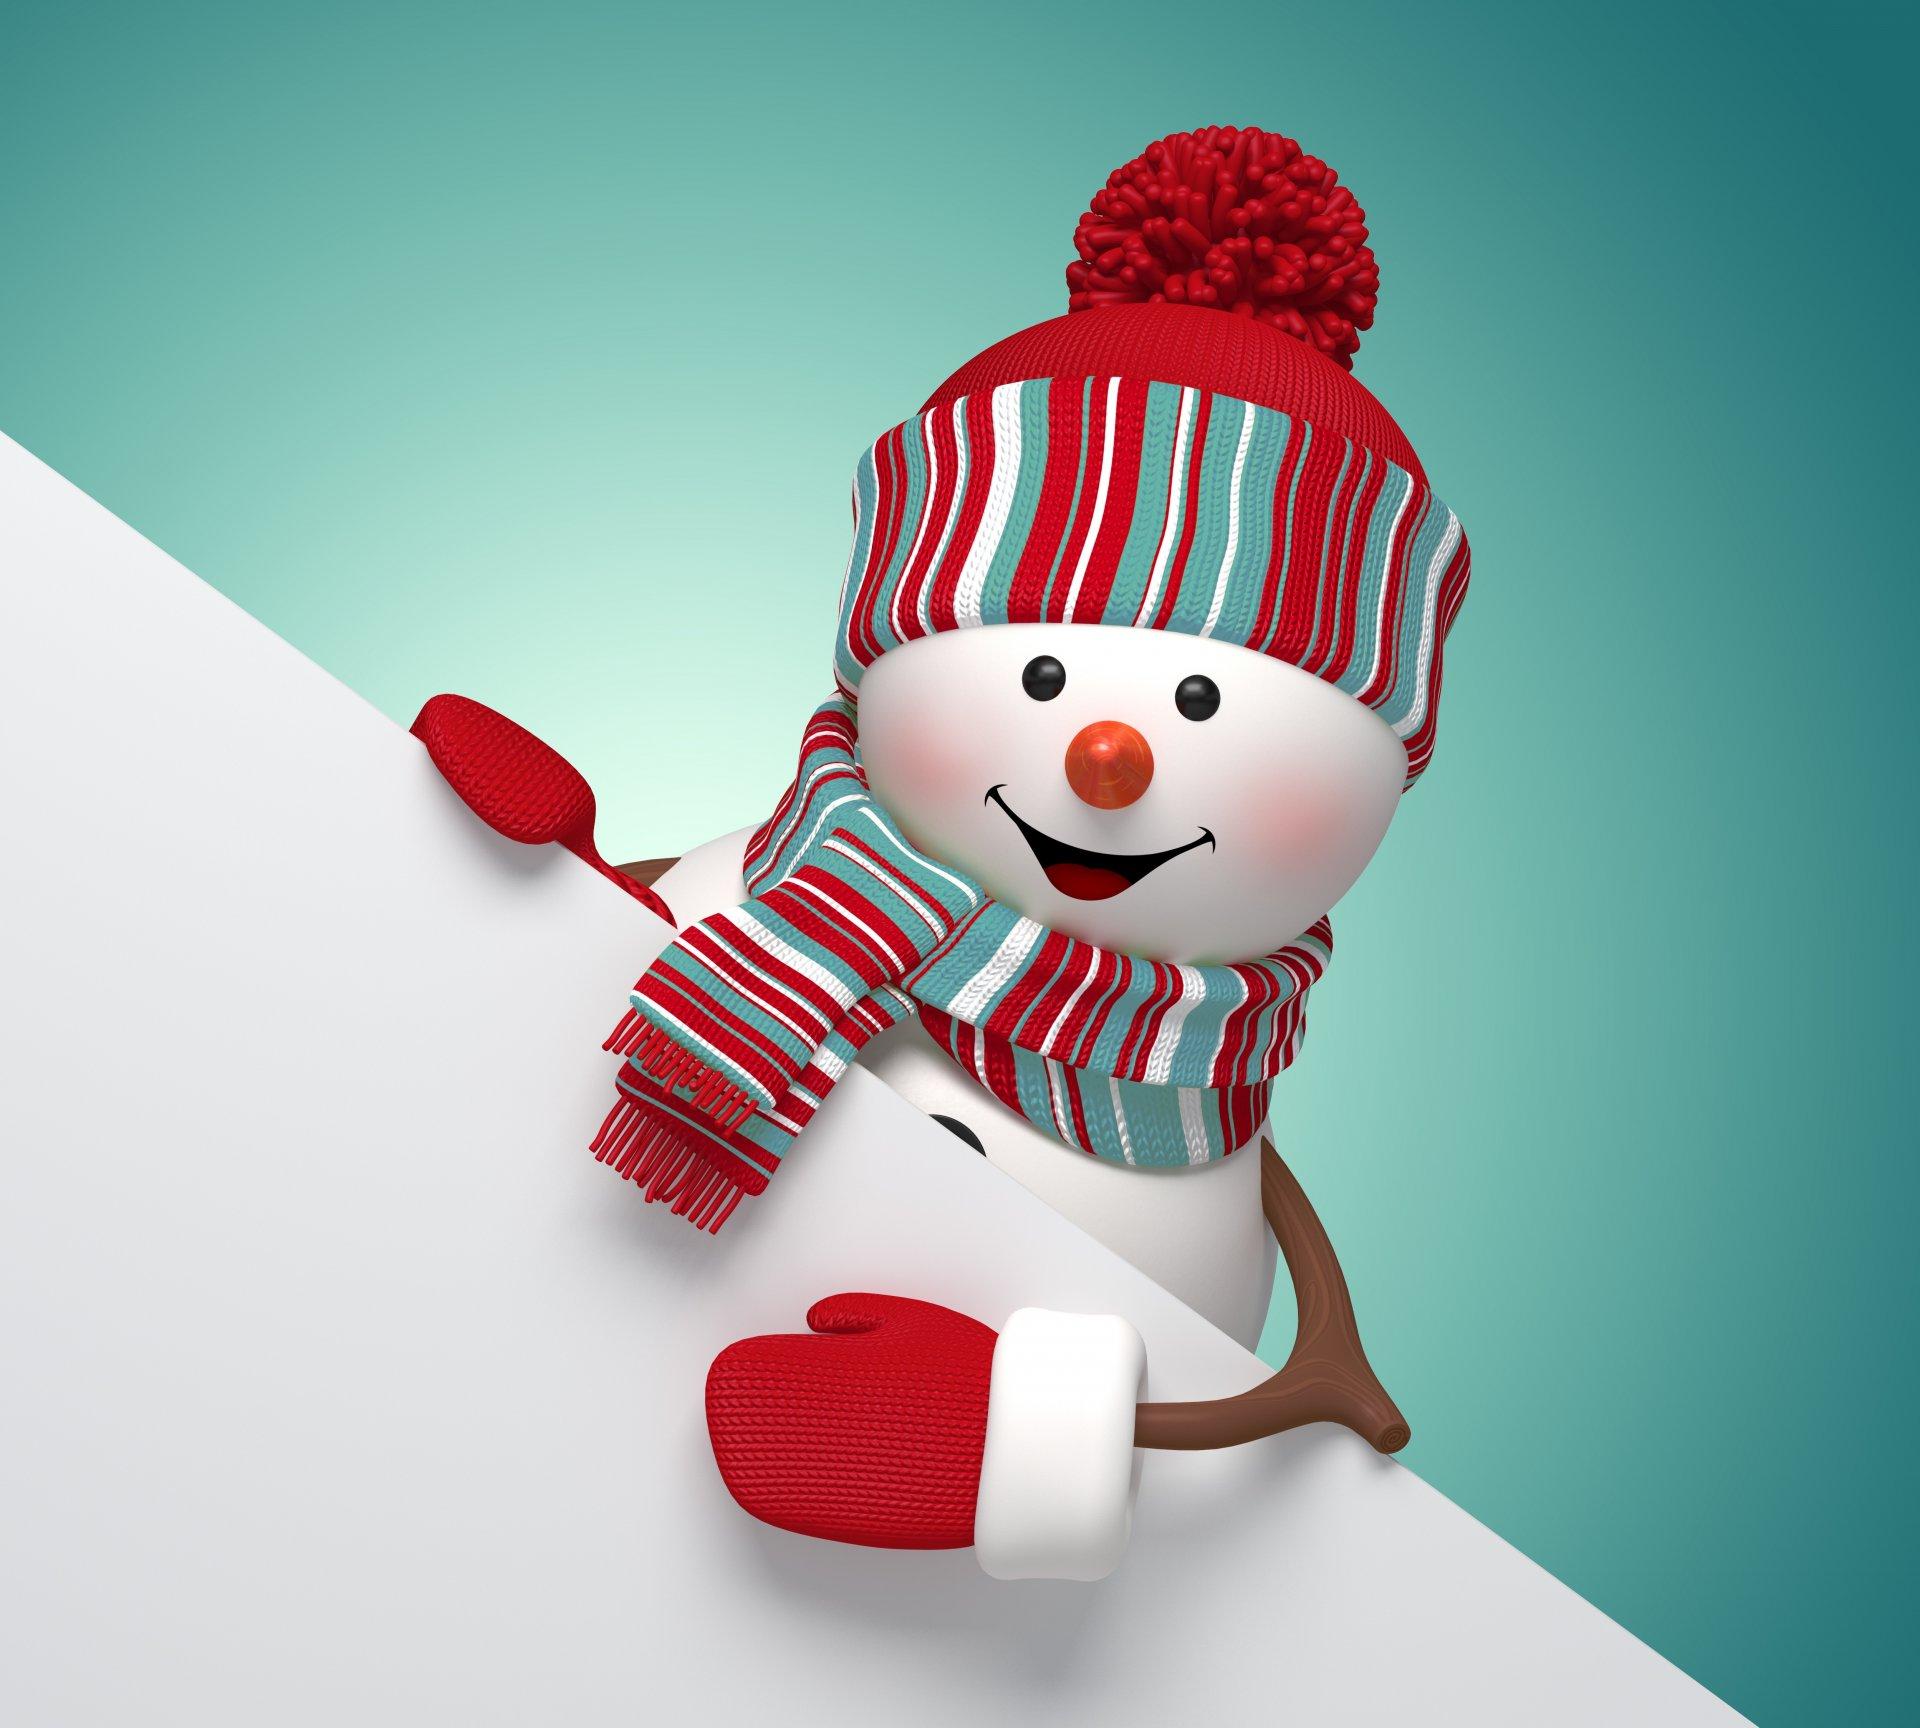 Картинка с снеговиком, про